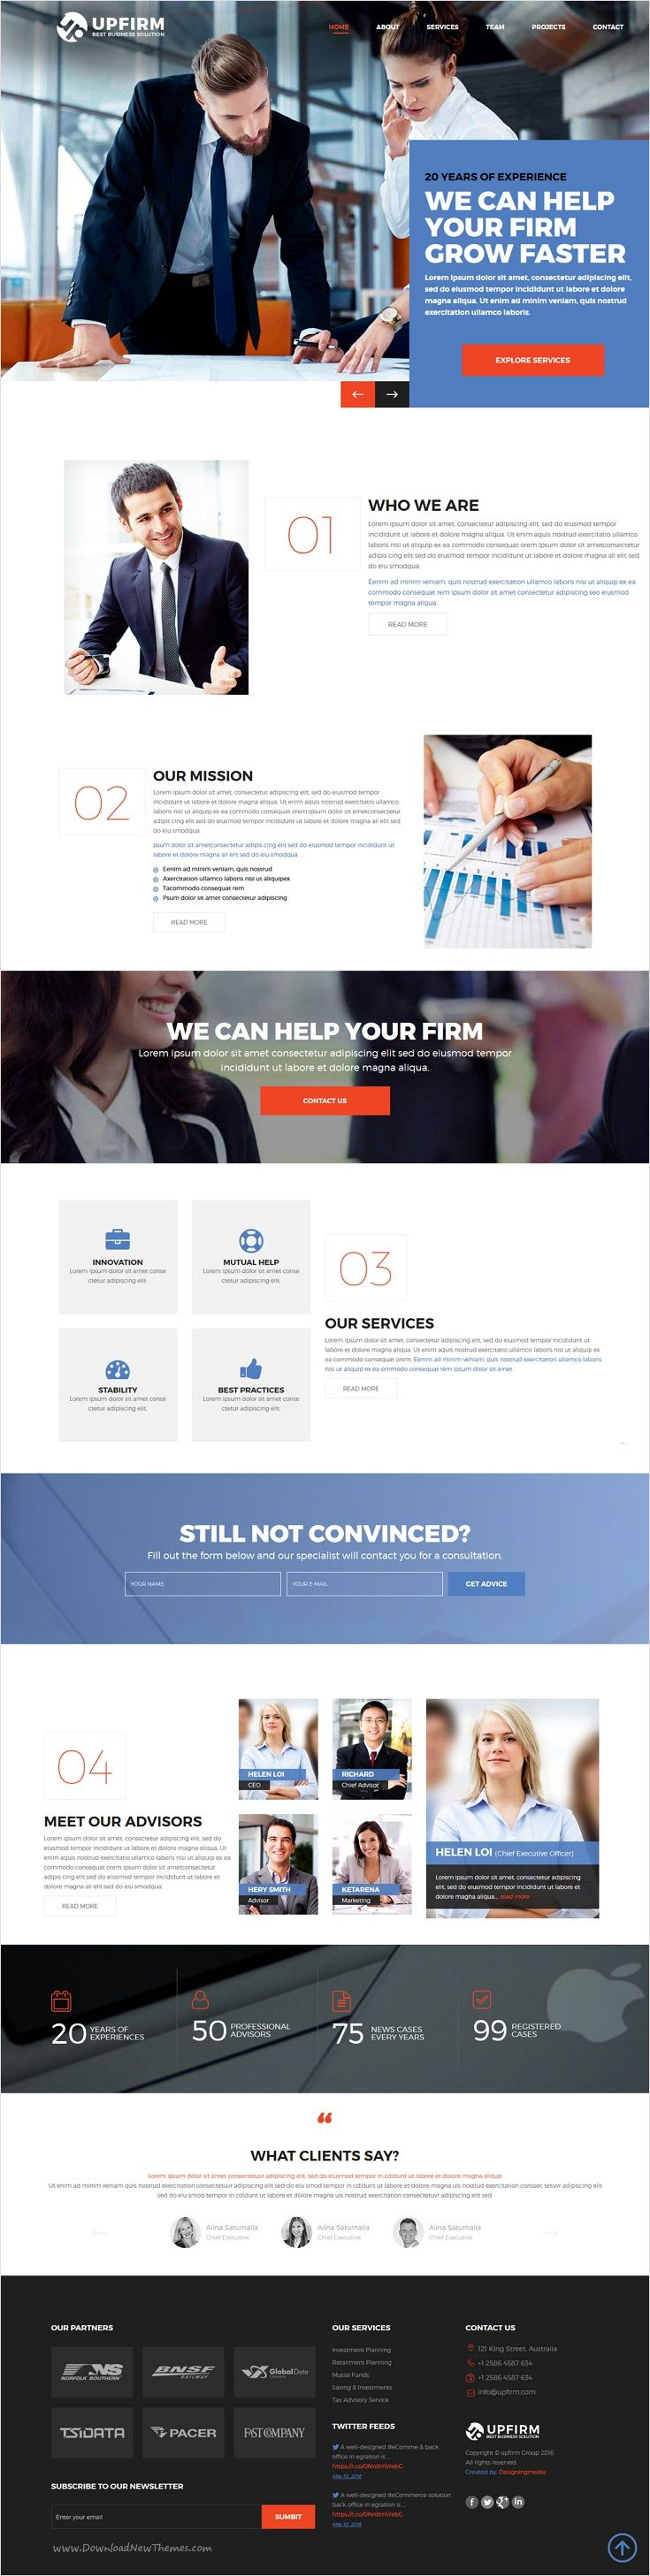 UpFirm Multi Purpose HTML5 Website Template | Template, Website ...